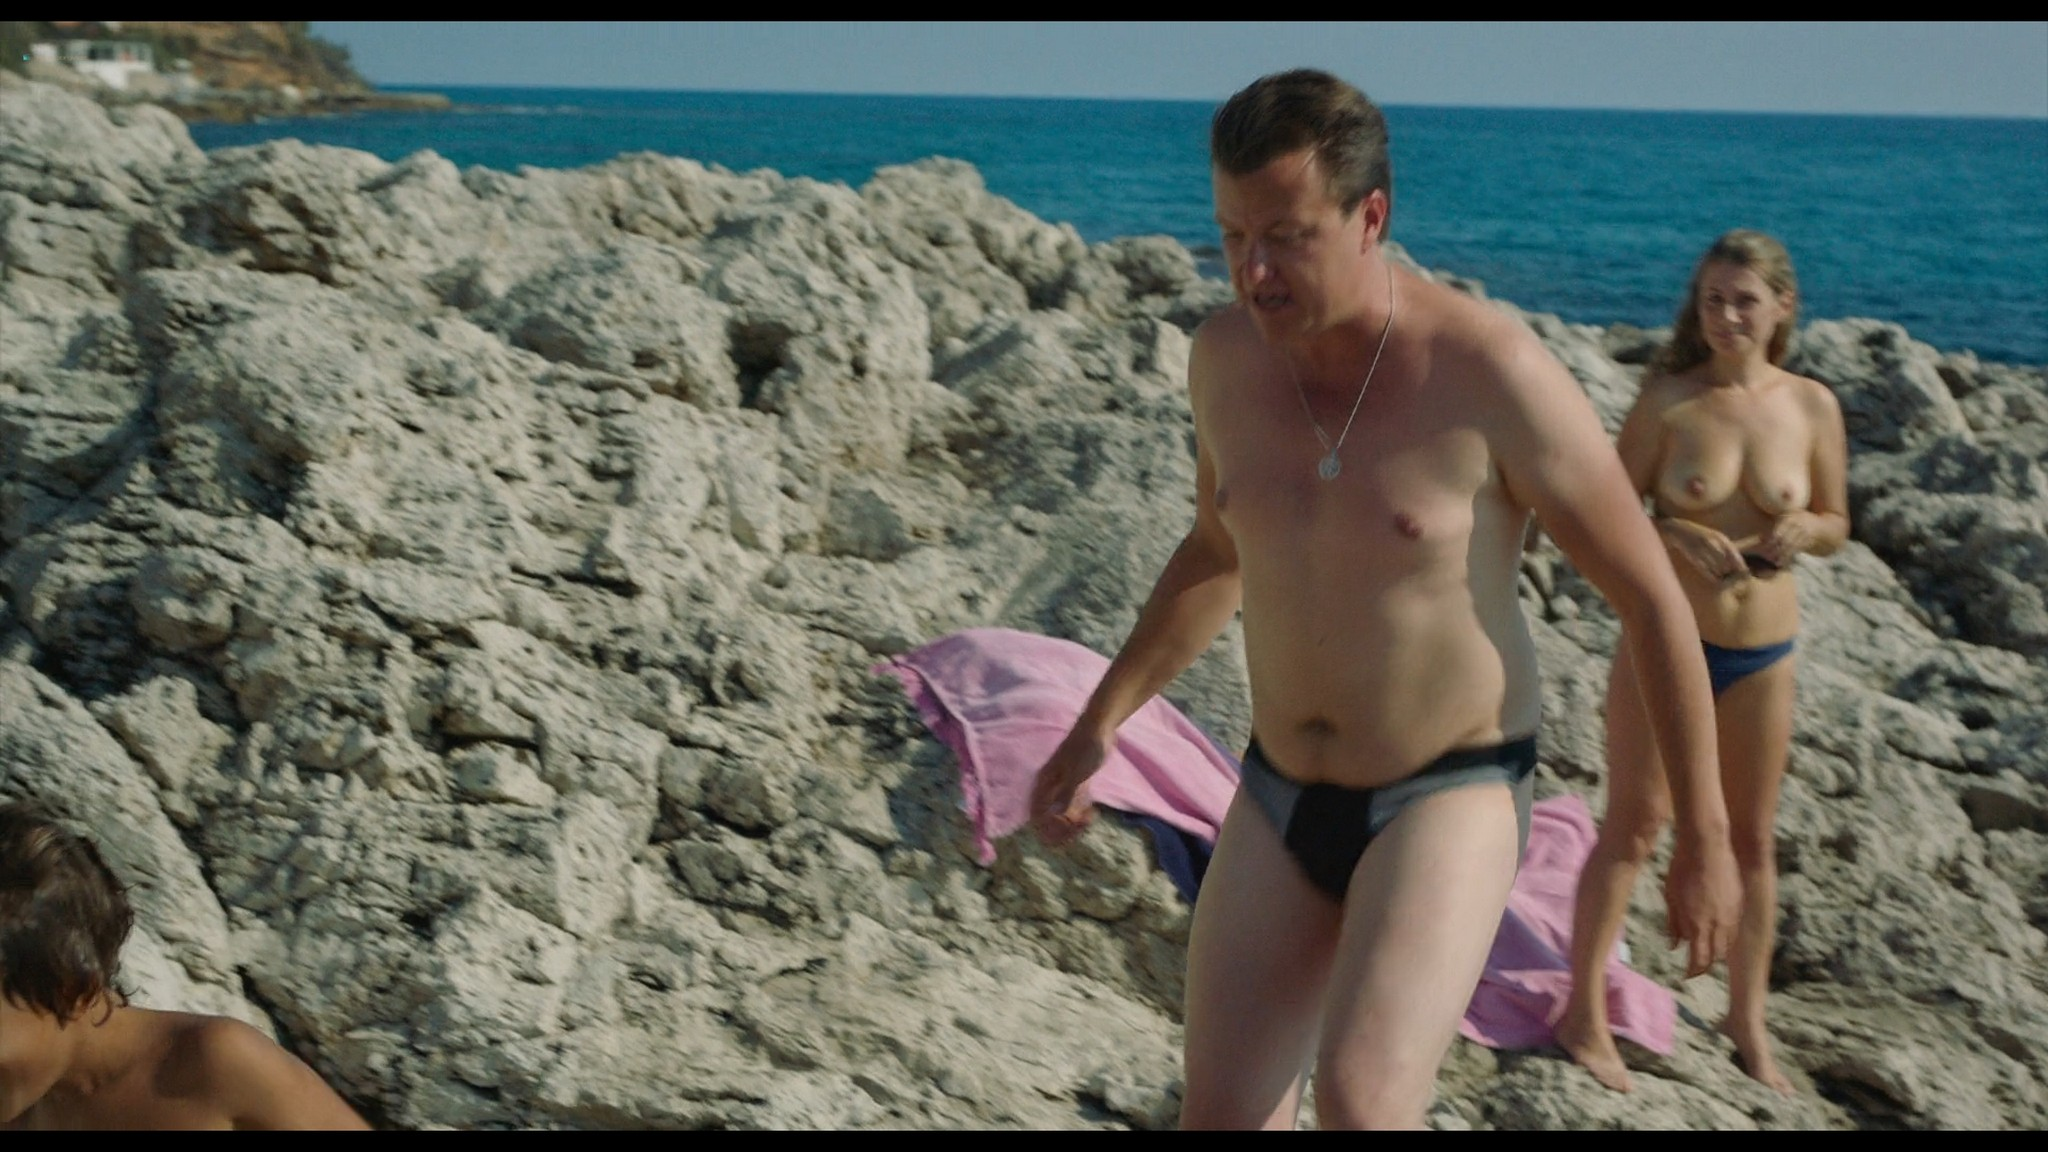 Bianca Cedrone sexy Hannah van der Westhuysen Emma Curtis hot A Little Italian Vacation 2021 1080p Web 4